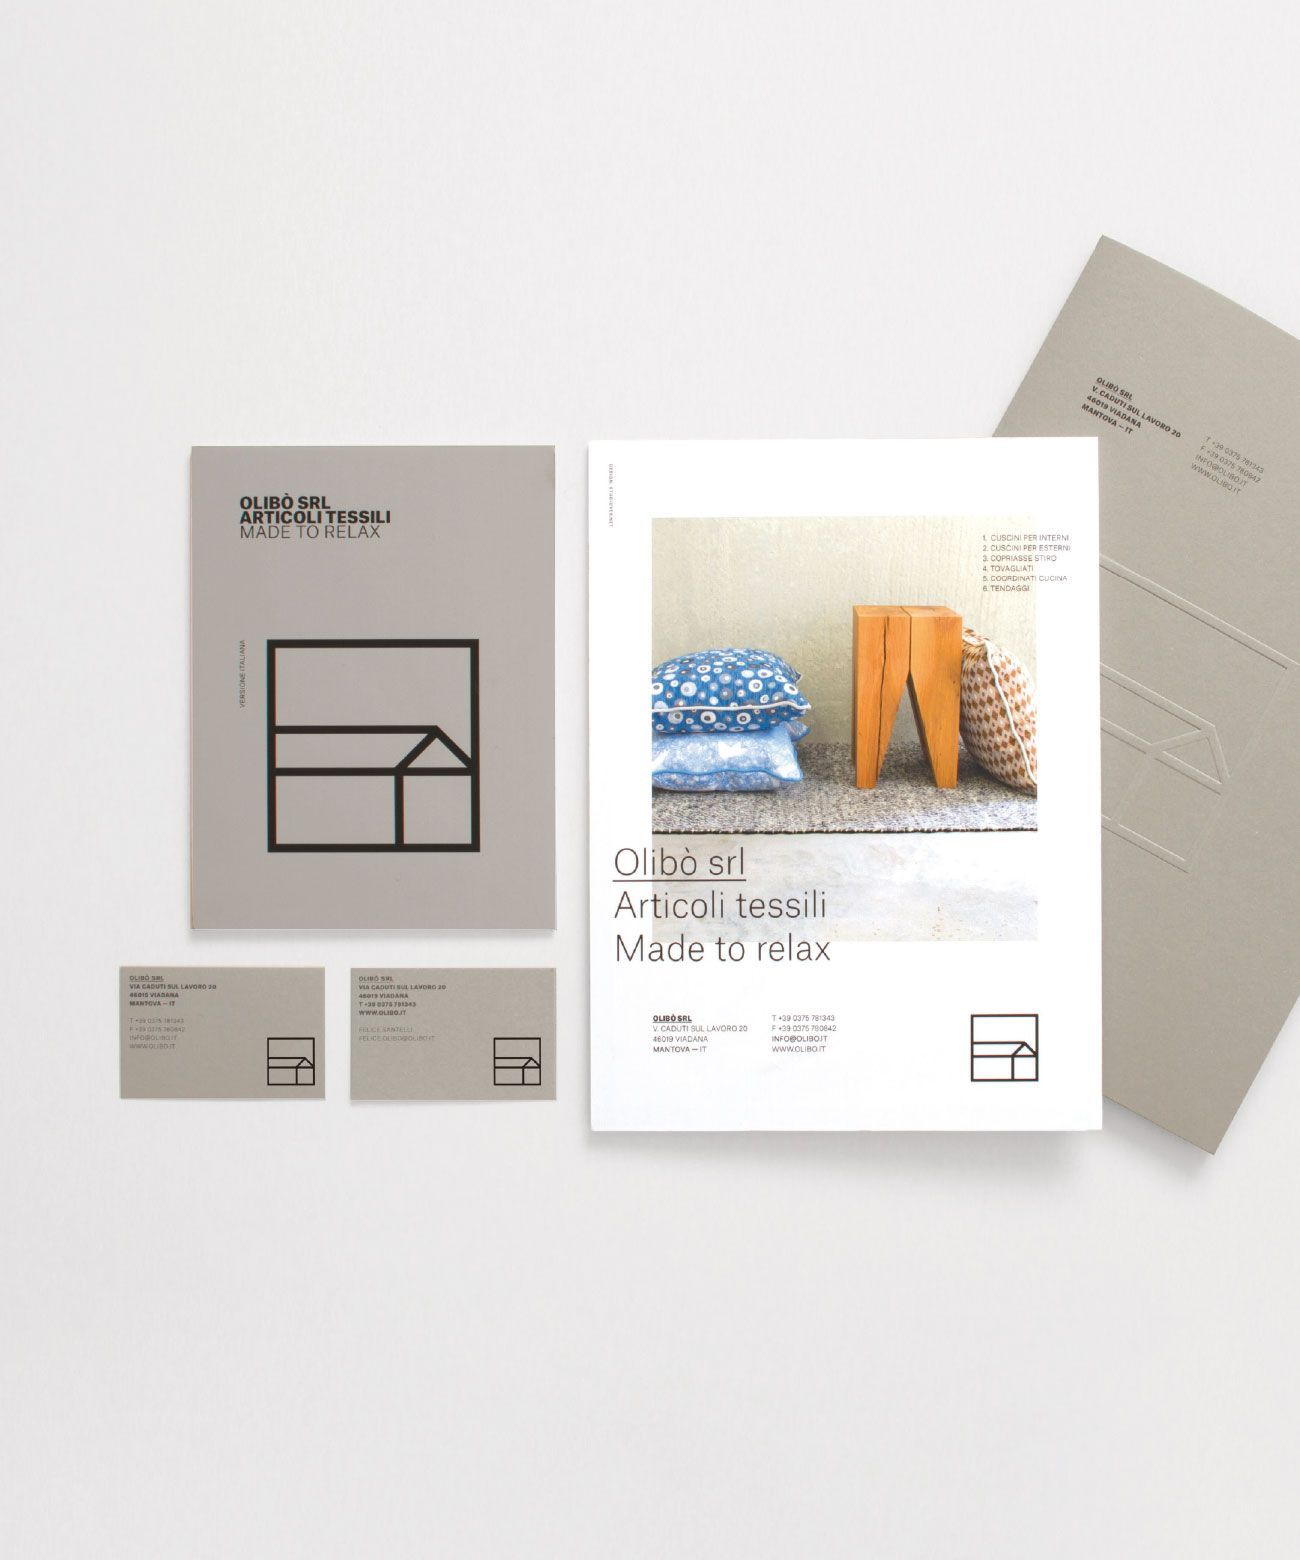 Cuscini Olibo.Studio Over Olibo Textile Industry Branding Logan